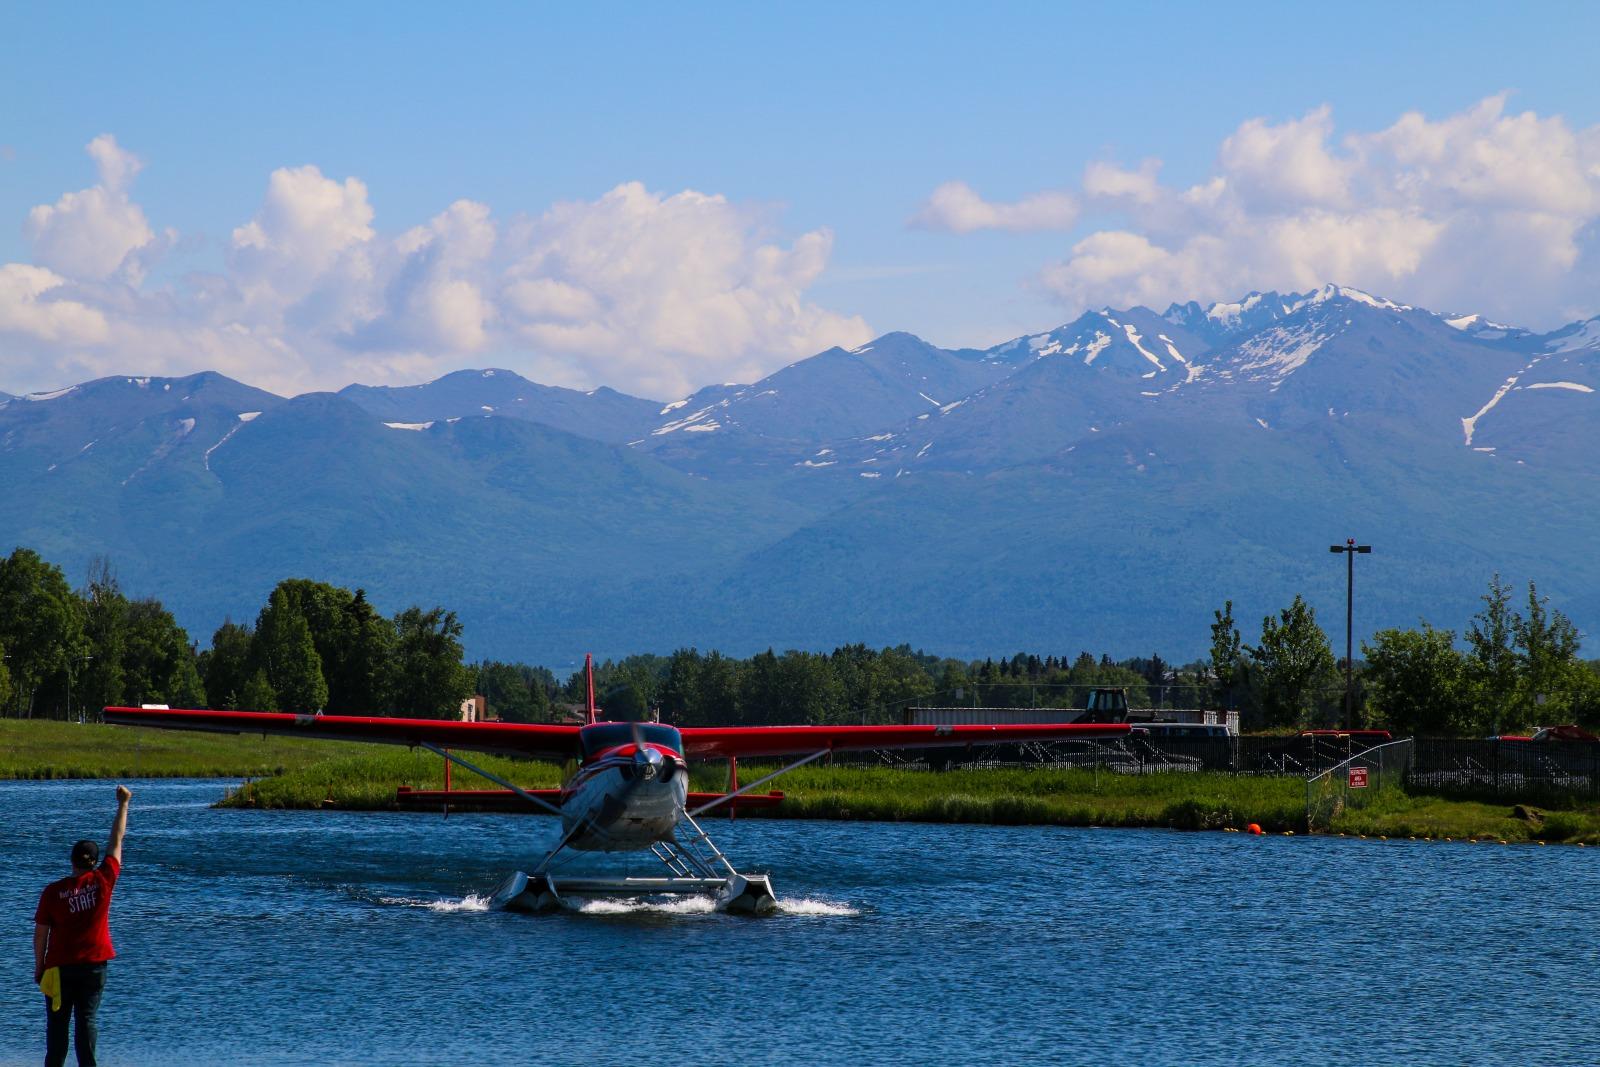 Float plane leaving the water in Alaska.